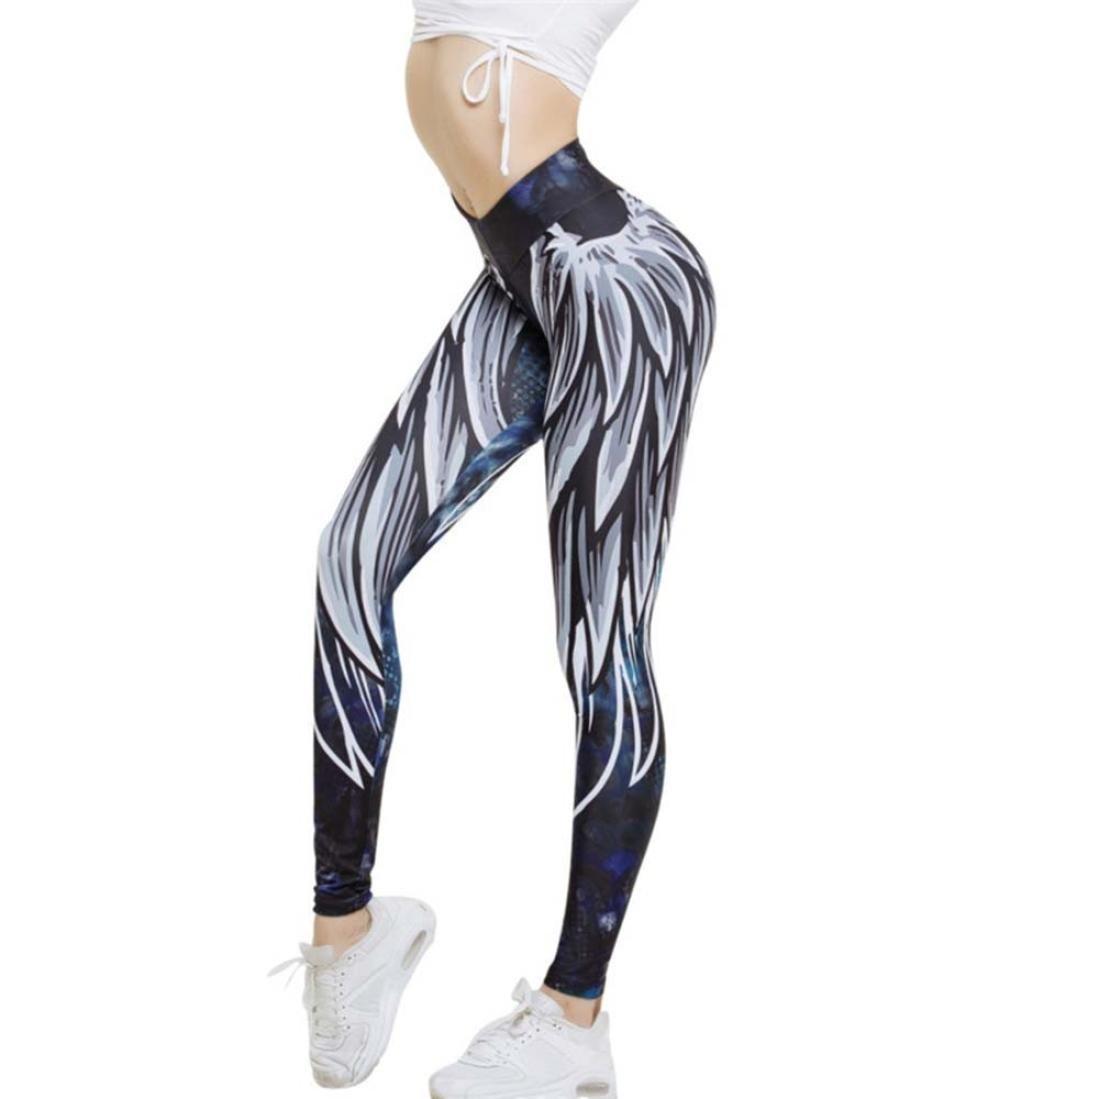 Mujer fitness Leggings deportivas❤Envío Gratis❤Yannerr ...